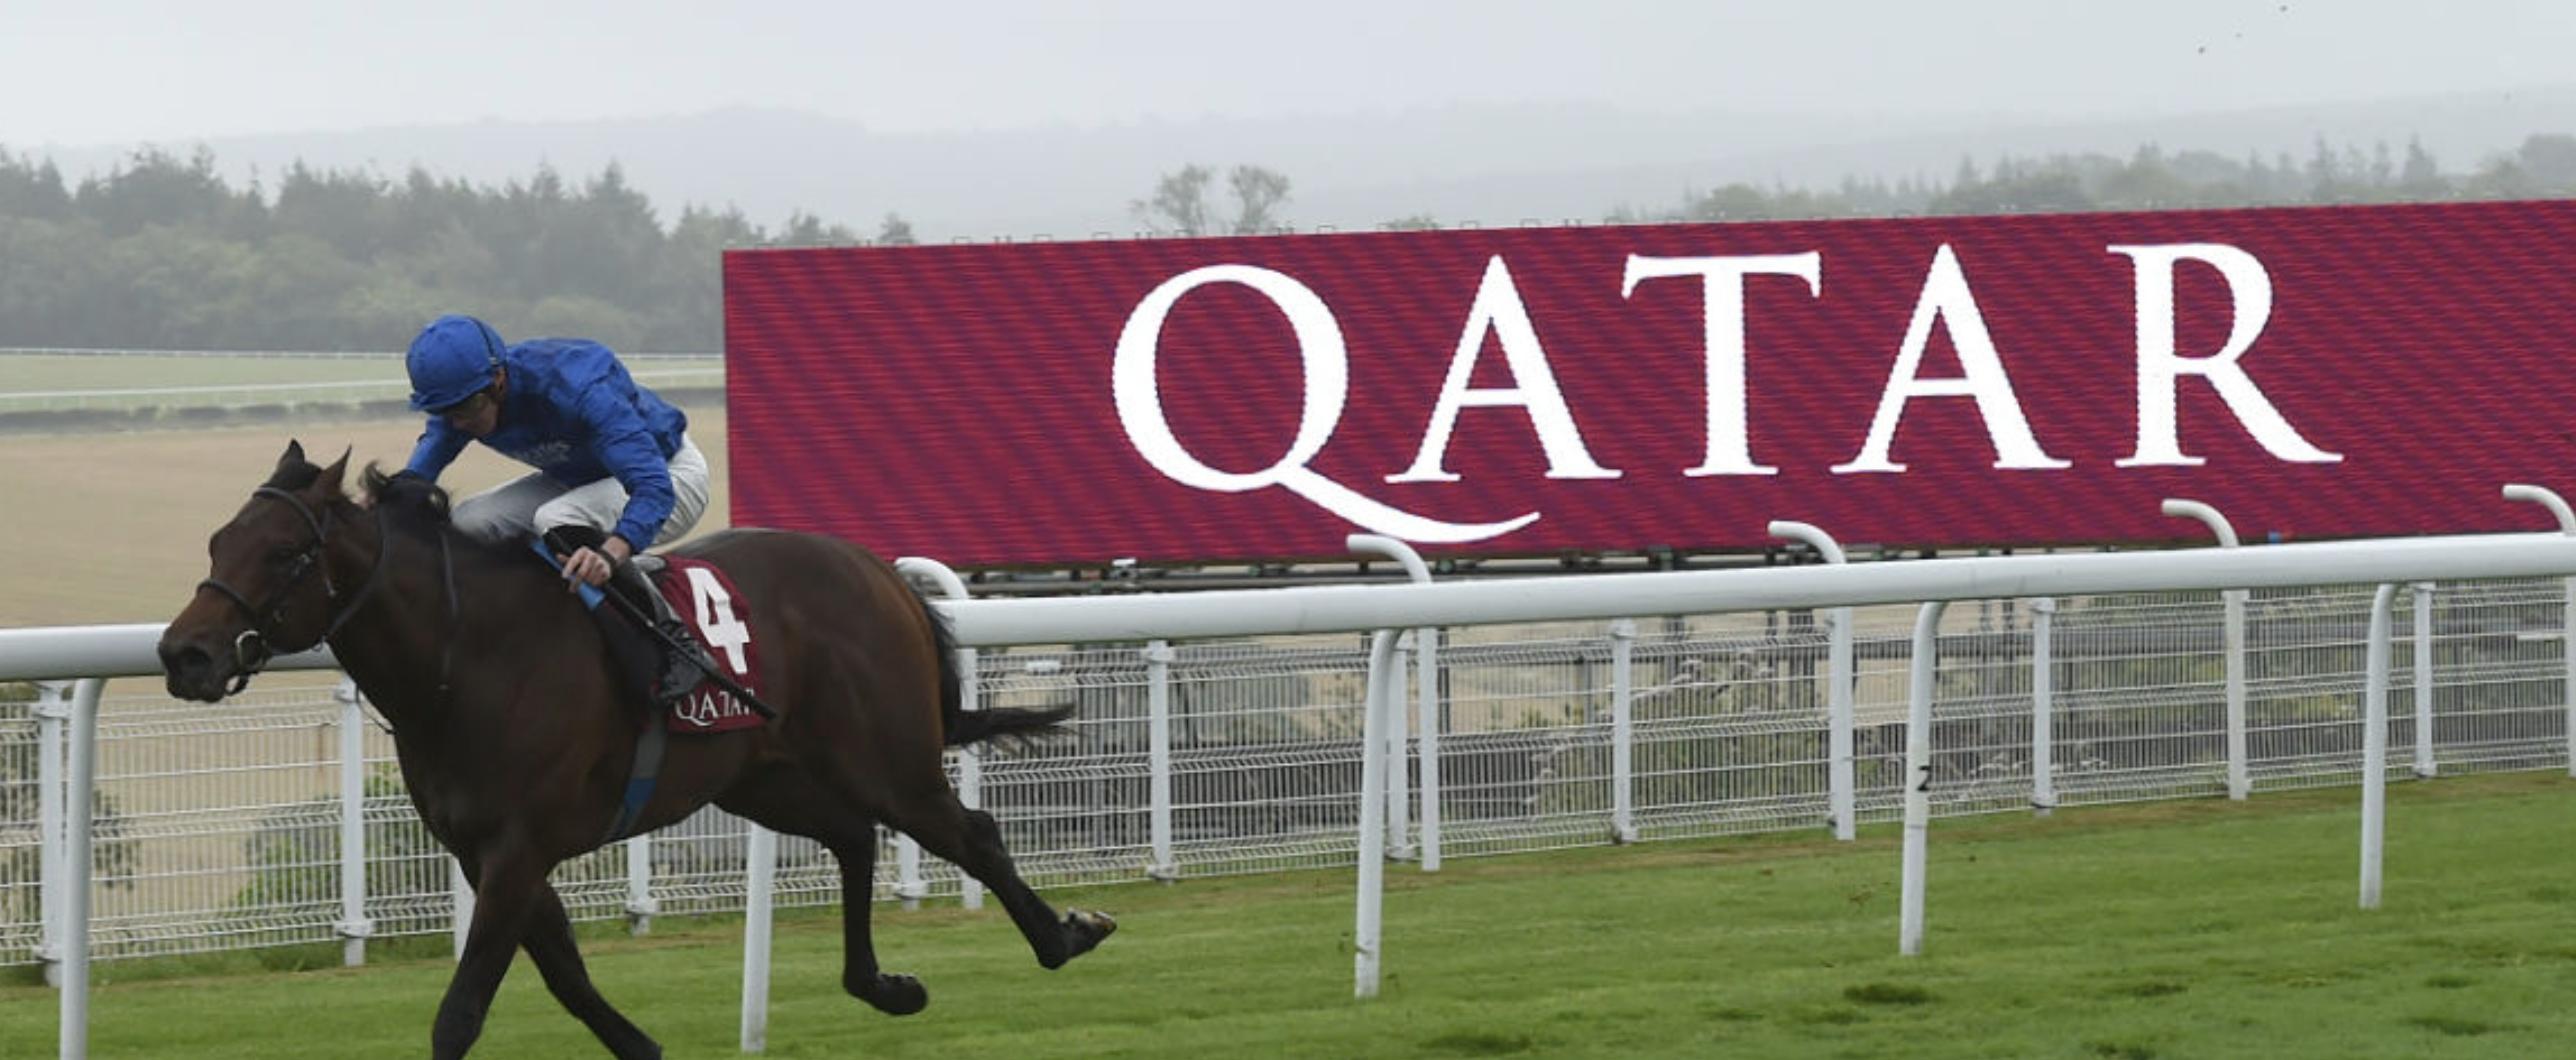 Qatar Airways renews partnership with Qatar Racing and Equestrian Club